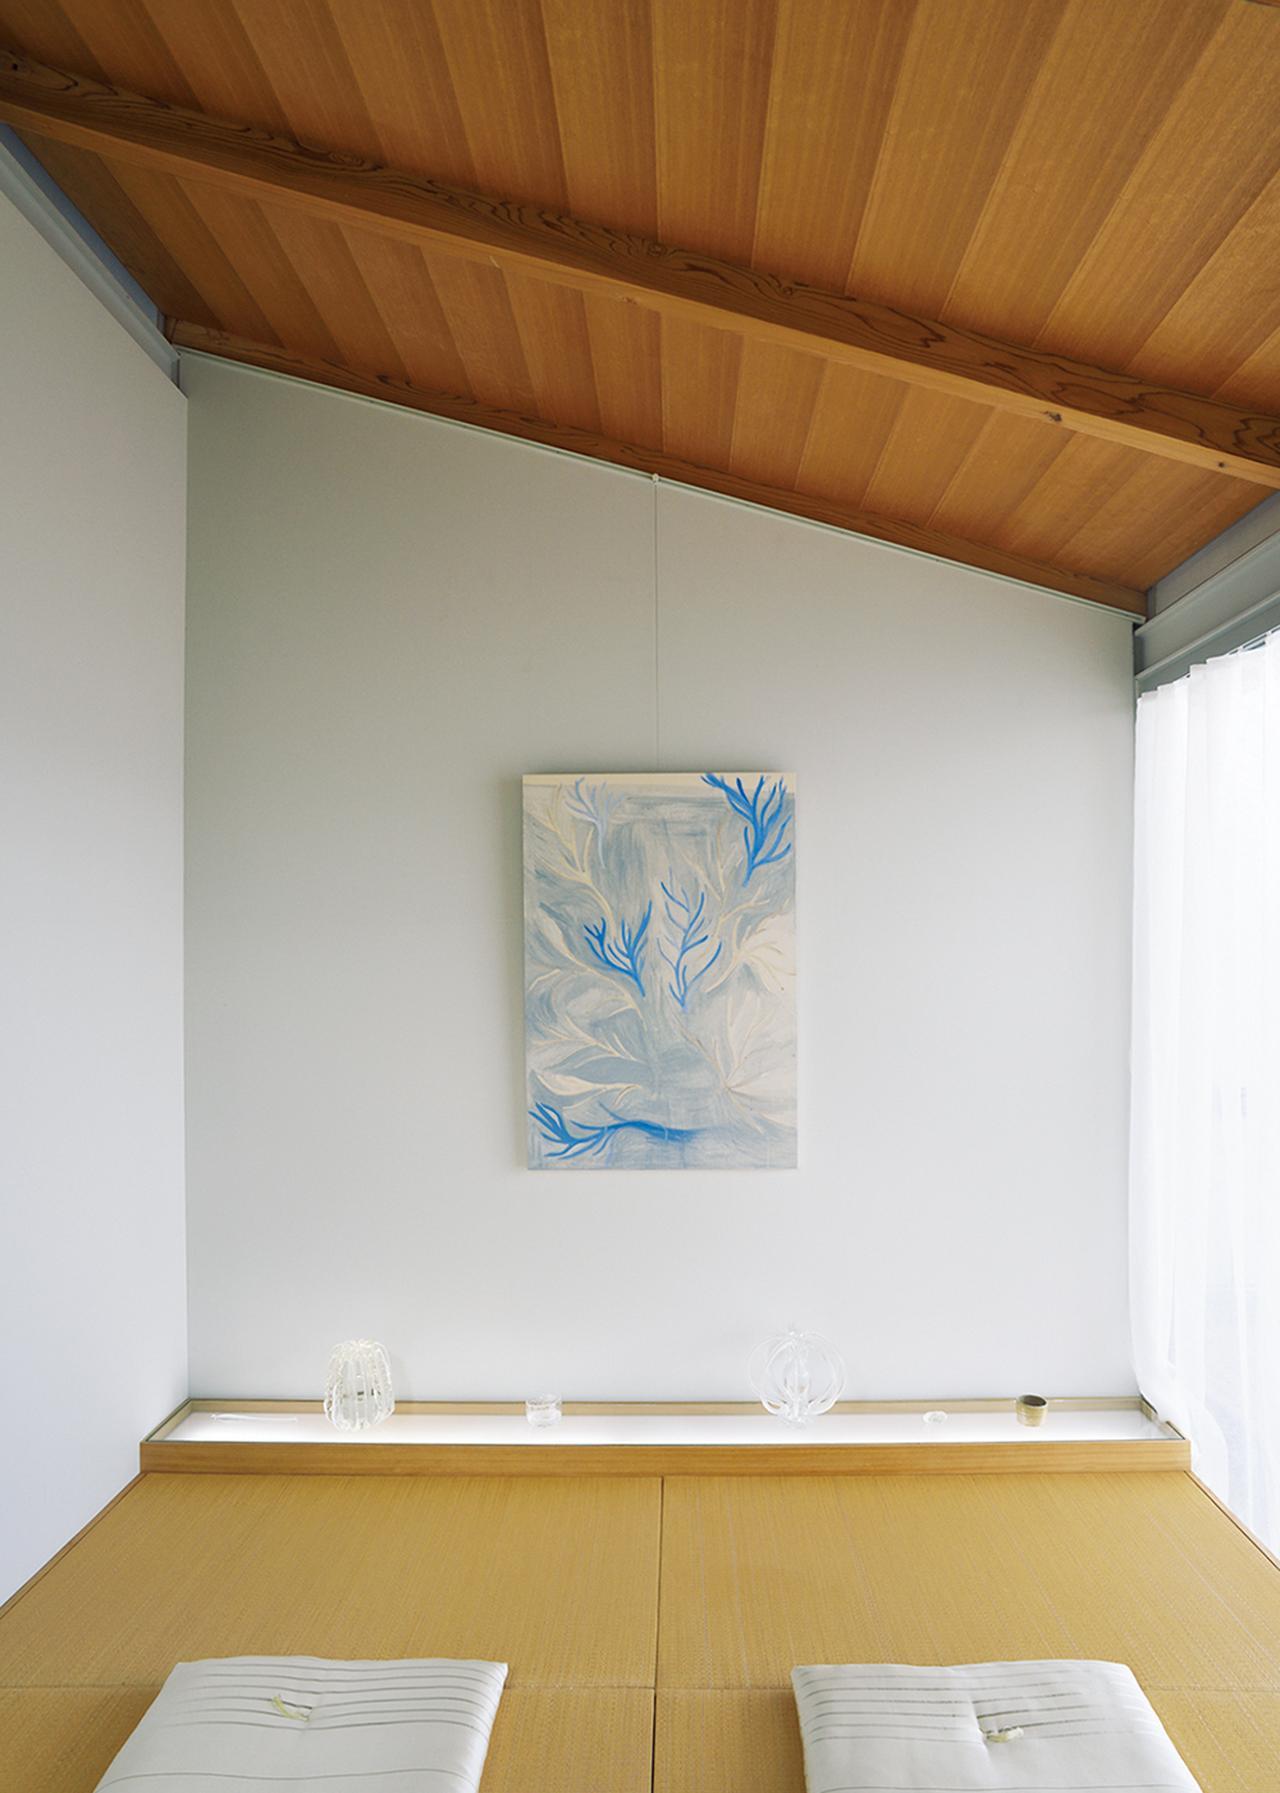 Images : 8番目の画像 - 「「西野山ハウス」の人々が紡ぐ 未来のユートピア」のアルバム - T JAPAN:The New York Times Style Magazine 公式サイト